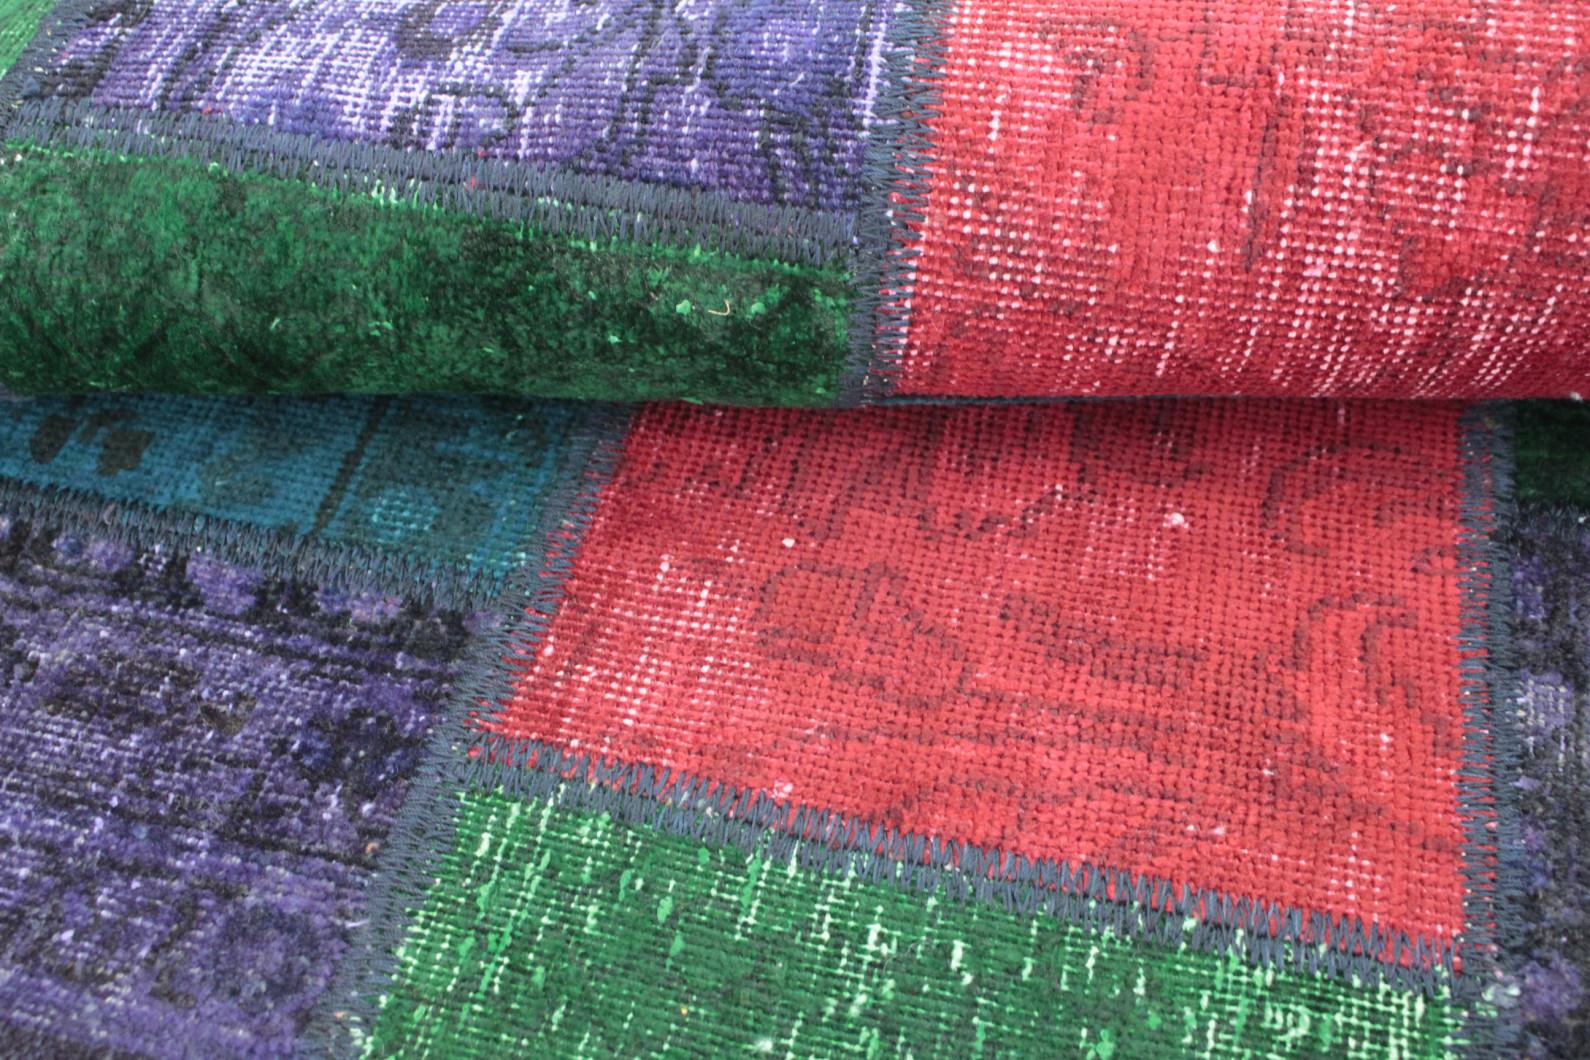 Patchwork Teppich Grün Türkis Lila Rot In 150x100 1001 167150 Bei